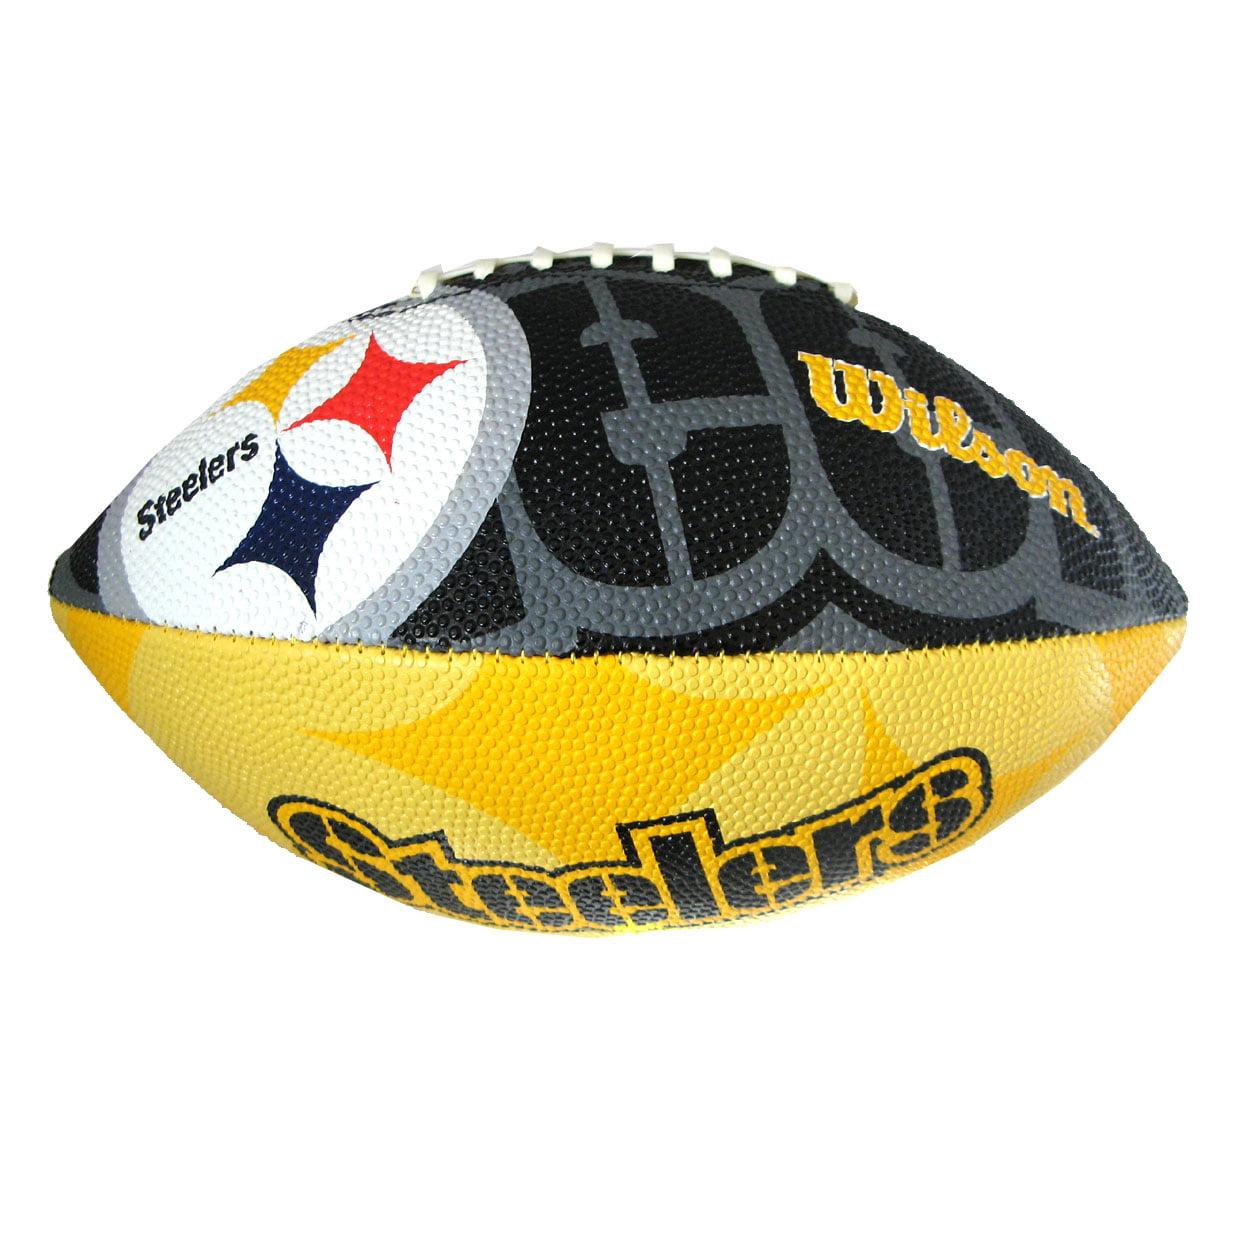 Wilson Sporting Goods Wilson Junior Logo Football NFL Pittsburgh Steelers by Wilson Sporting Goods Co.